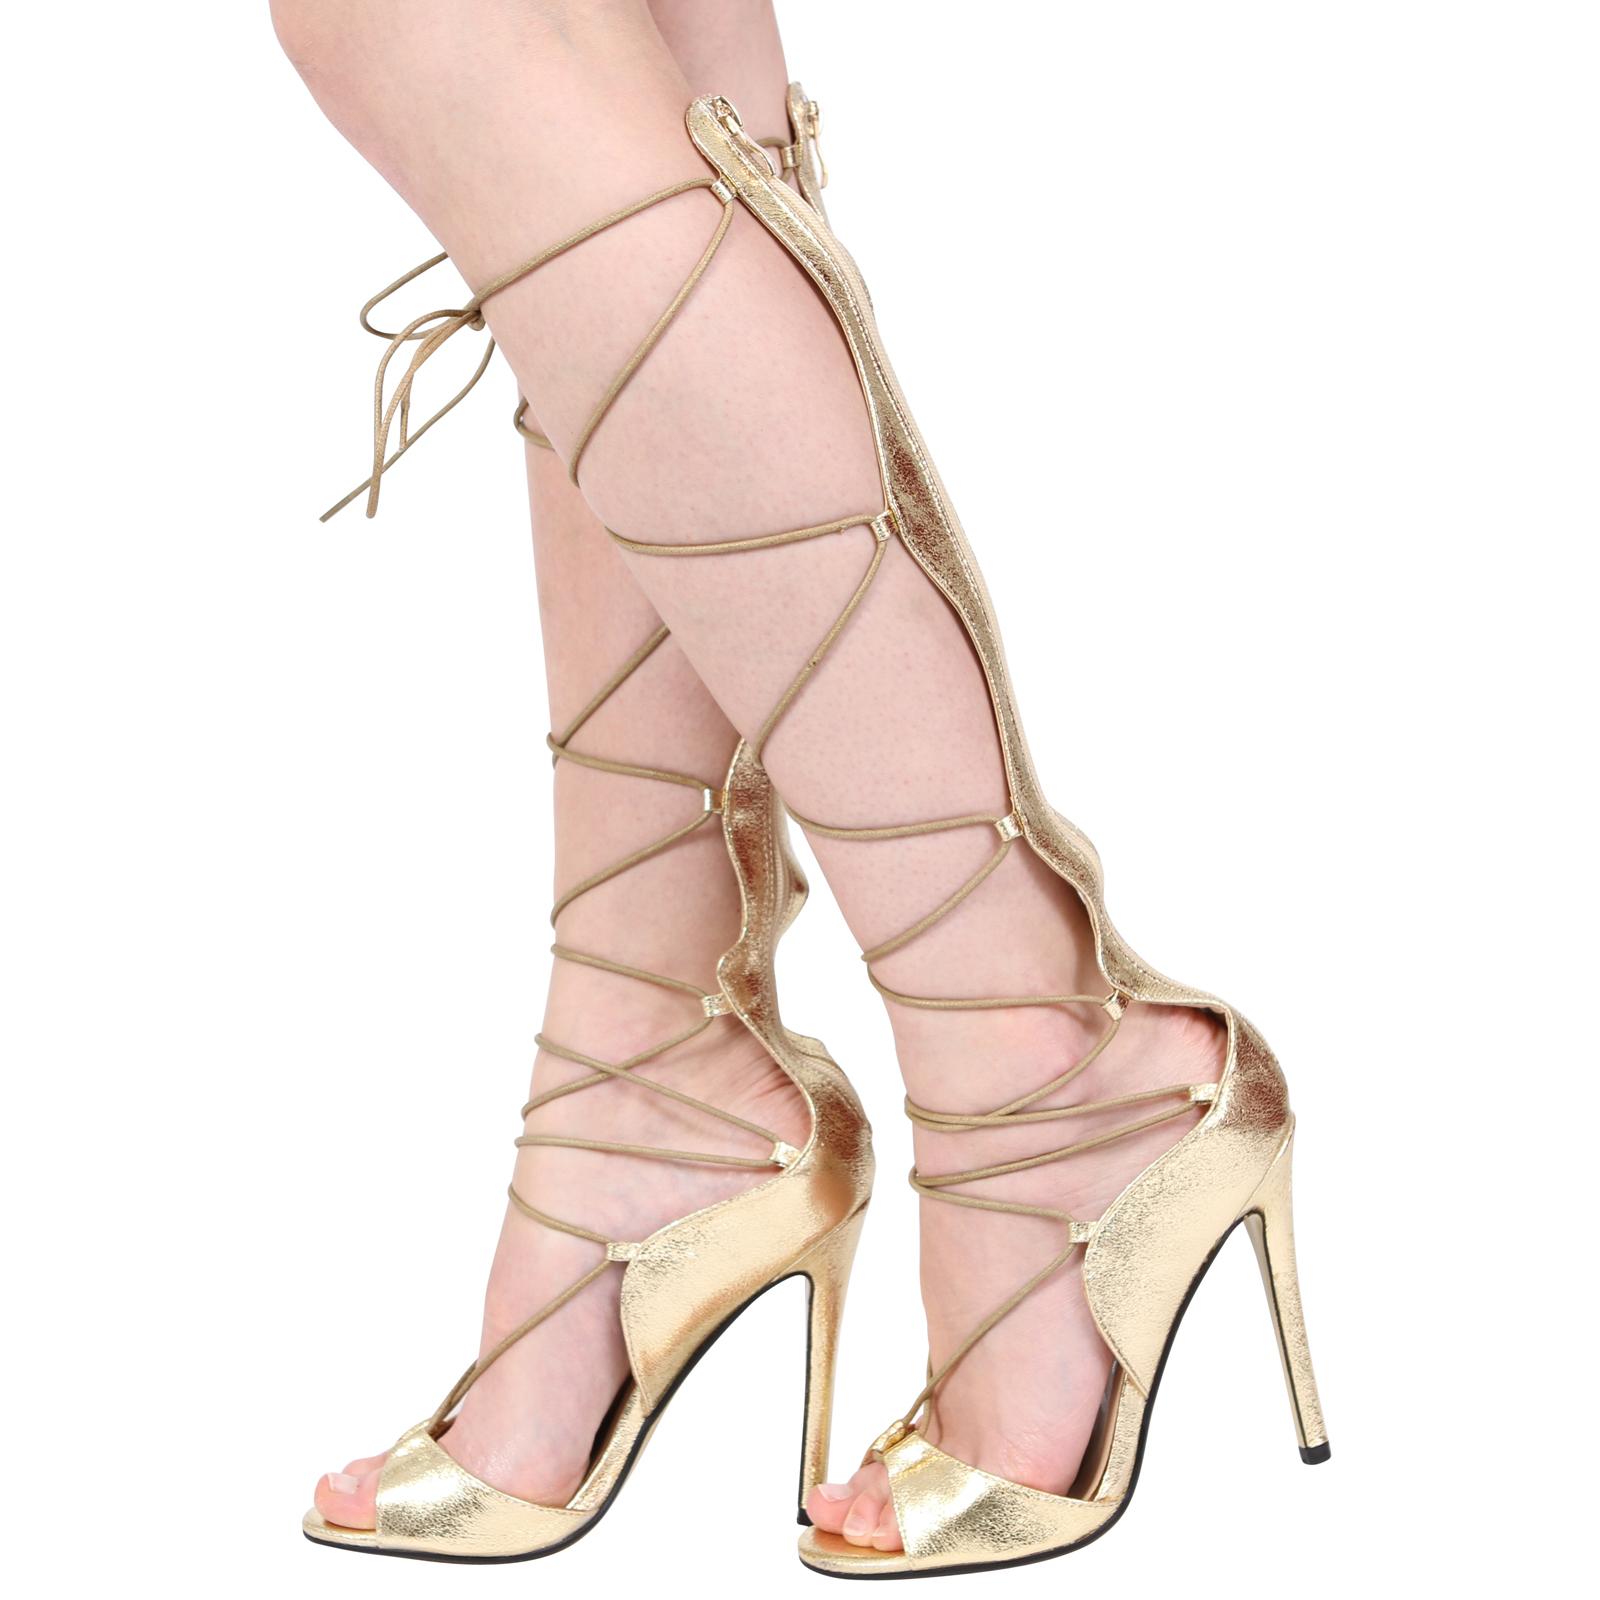 Silver Gladiator High Heels